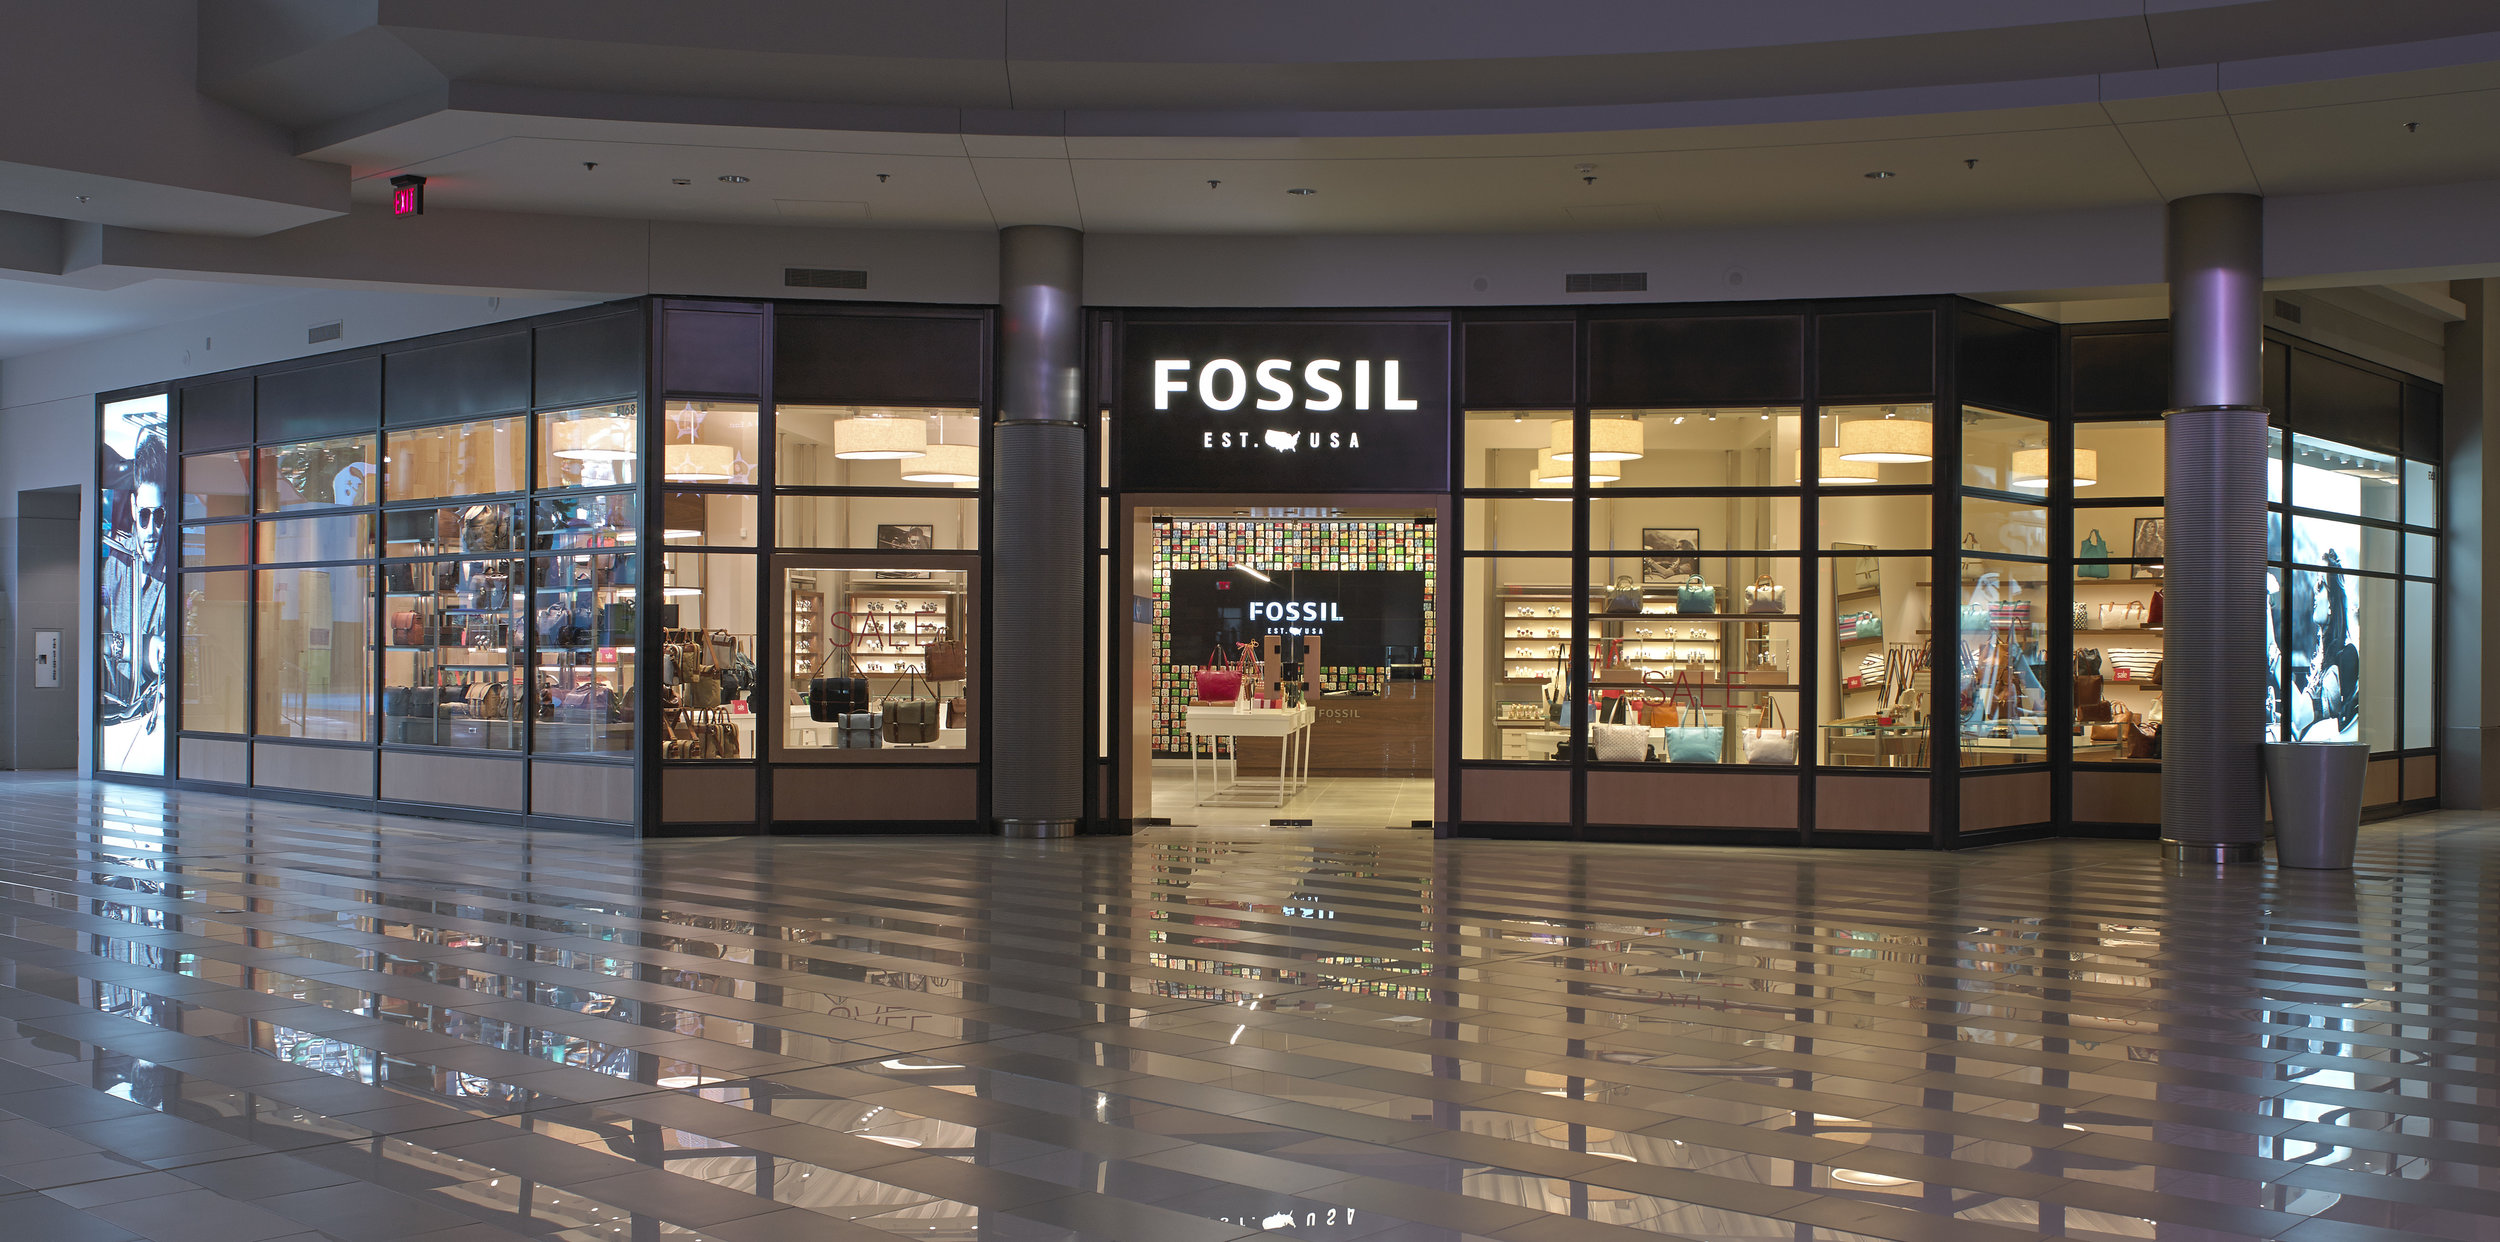 Fossil Image 6.jpg